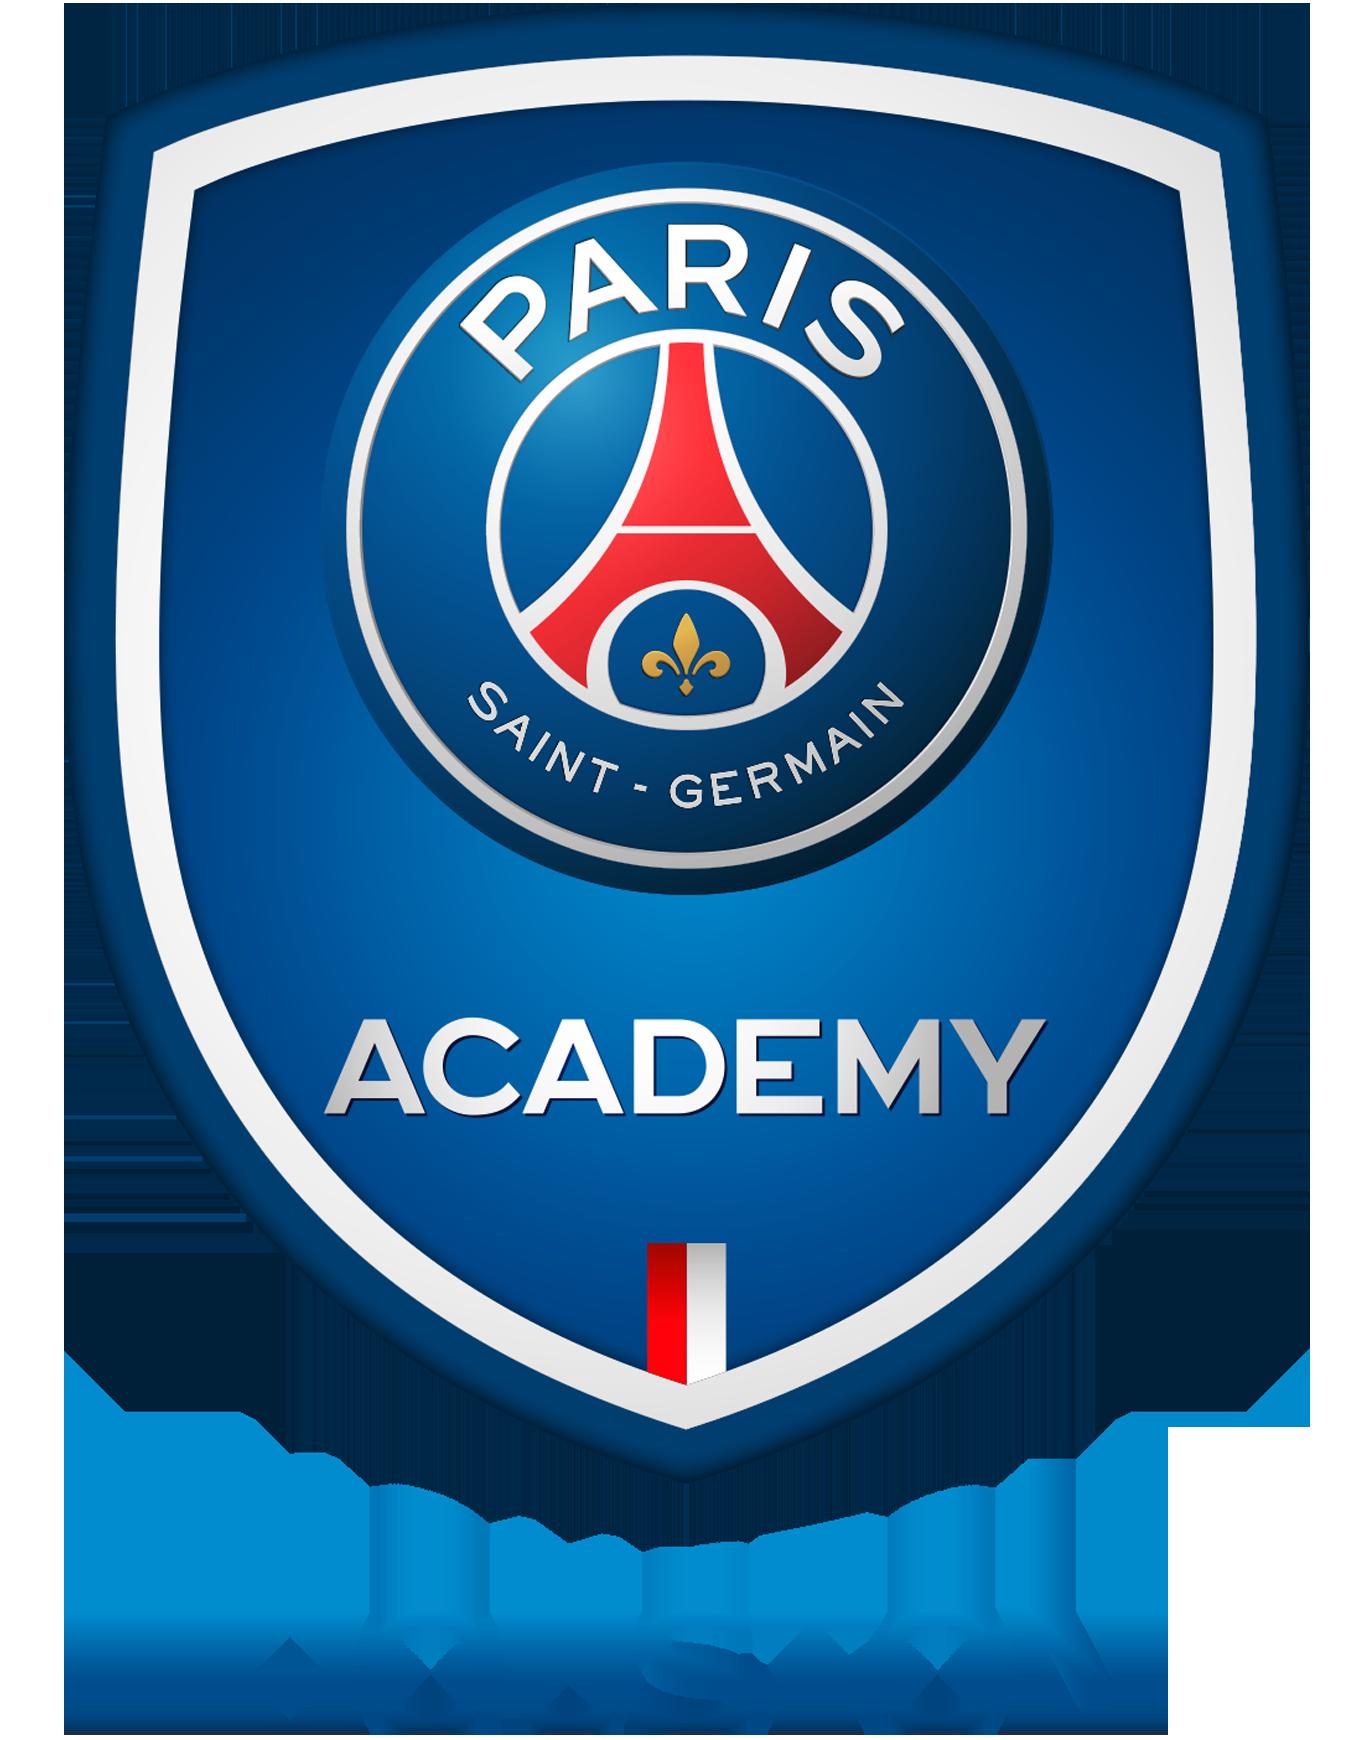 Paris Saint-Germain Academy Houston Soccer Club